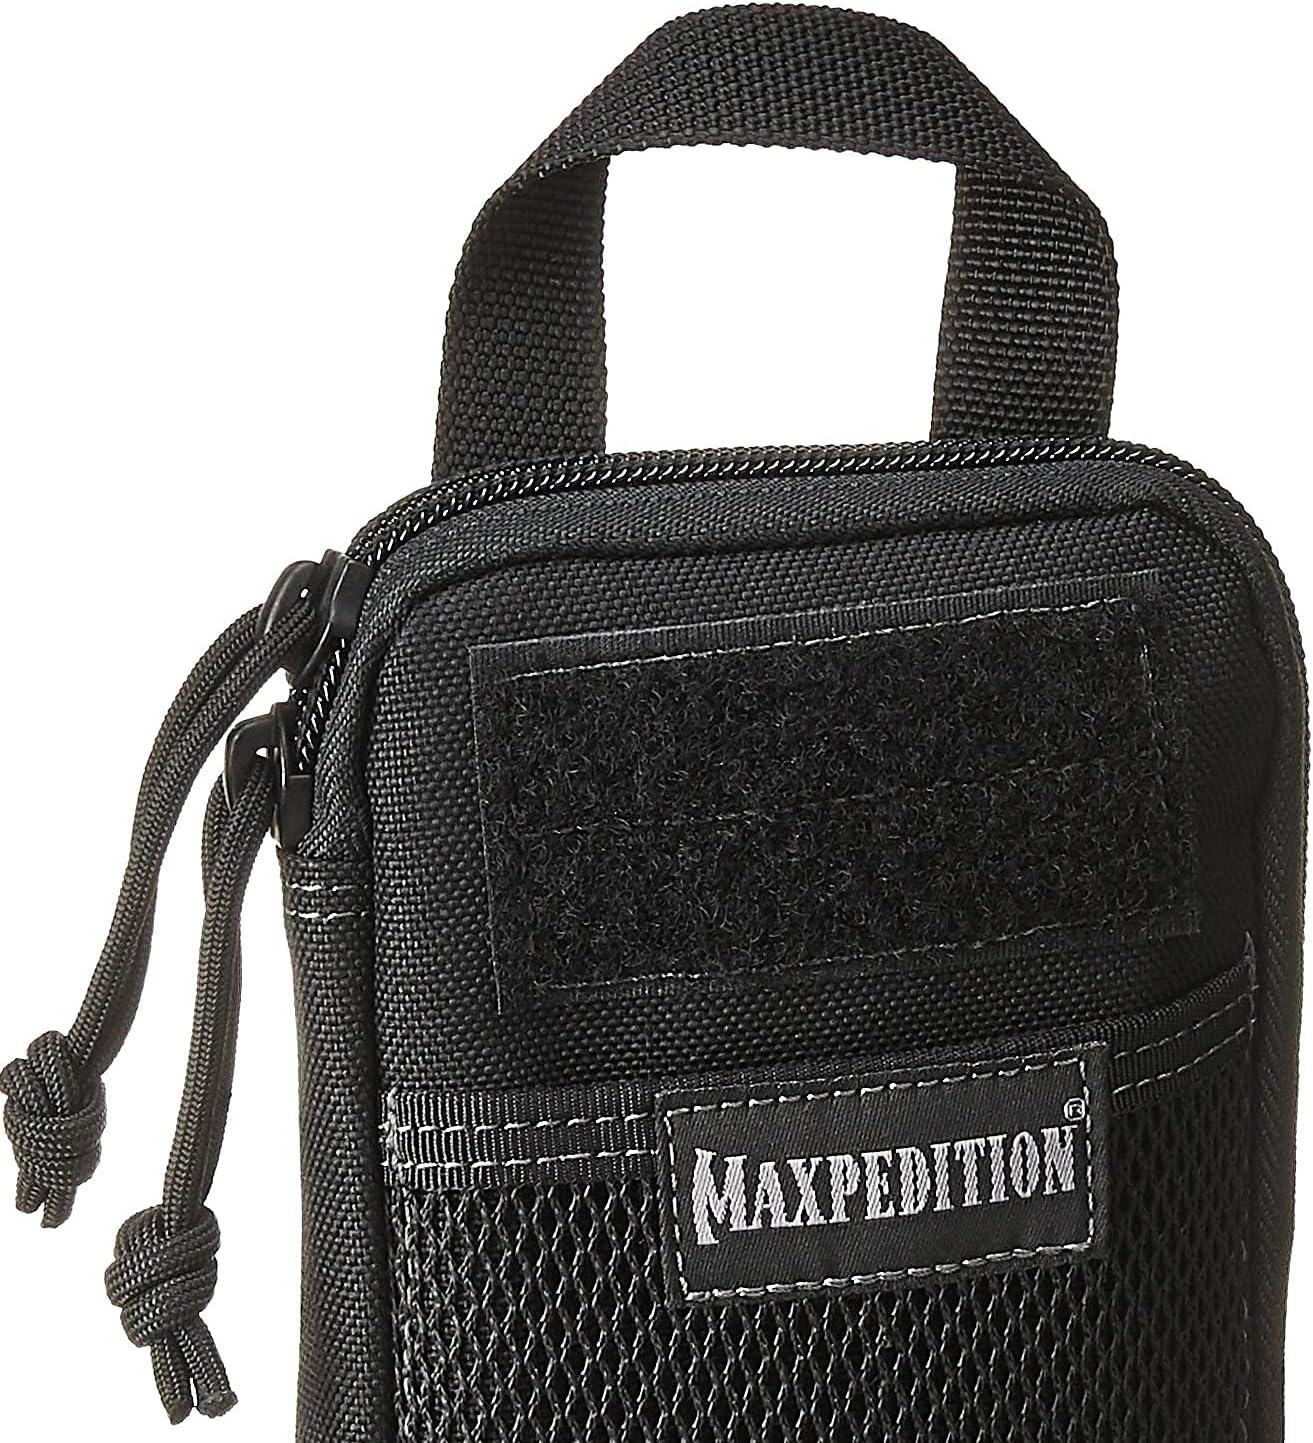 New Maxpedition EDC Pocket Organizer MX246F